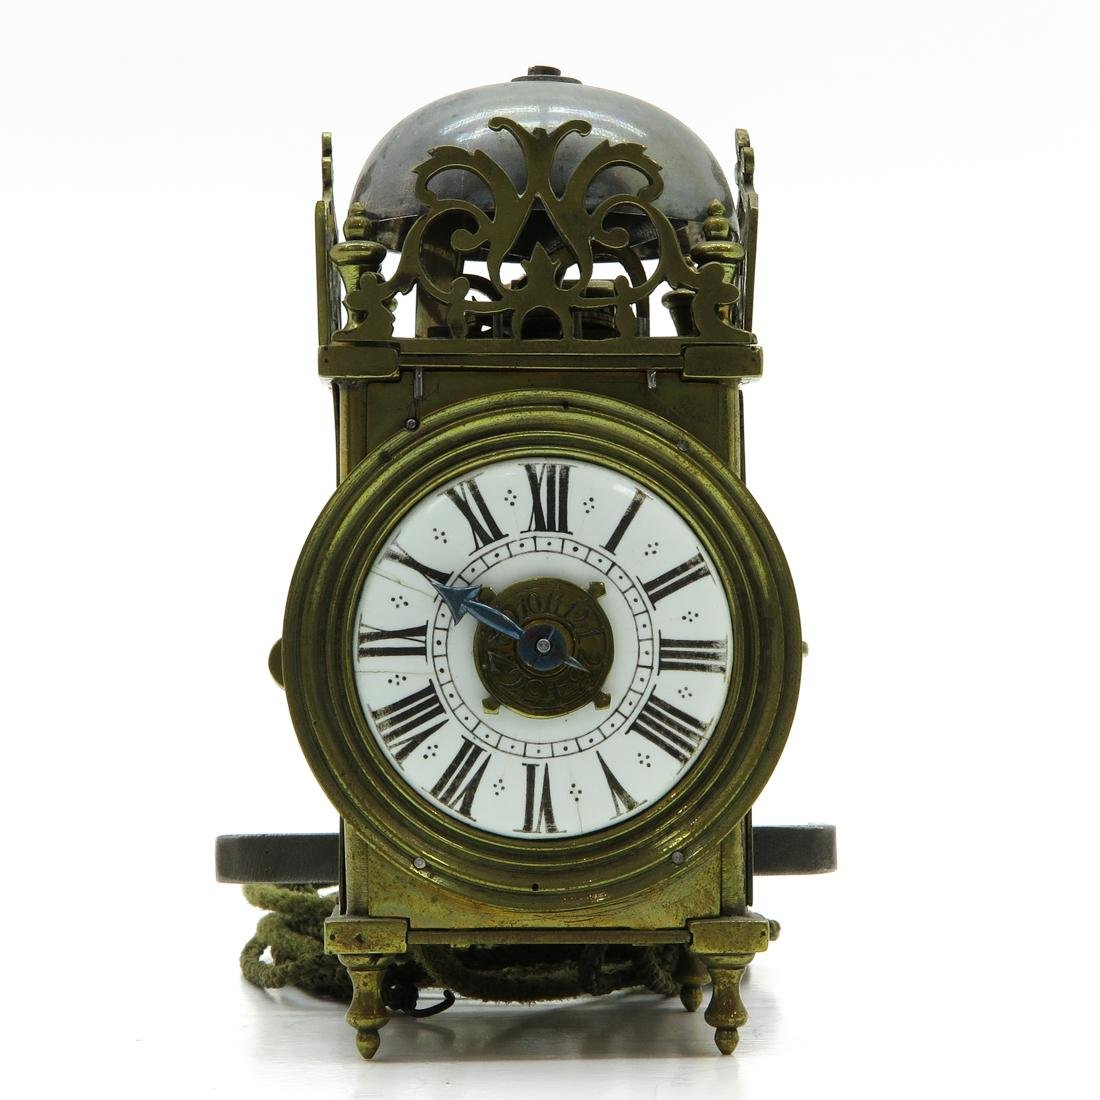 Miniature French Lantern Clock with Alarm Circa 1750